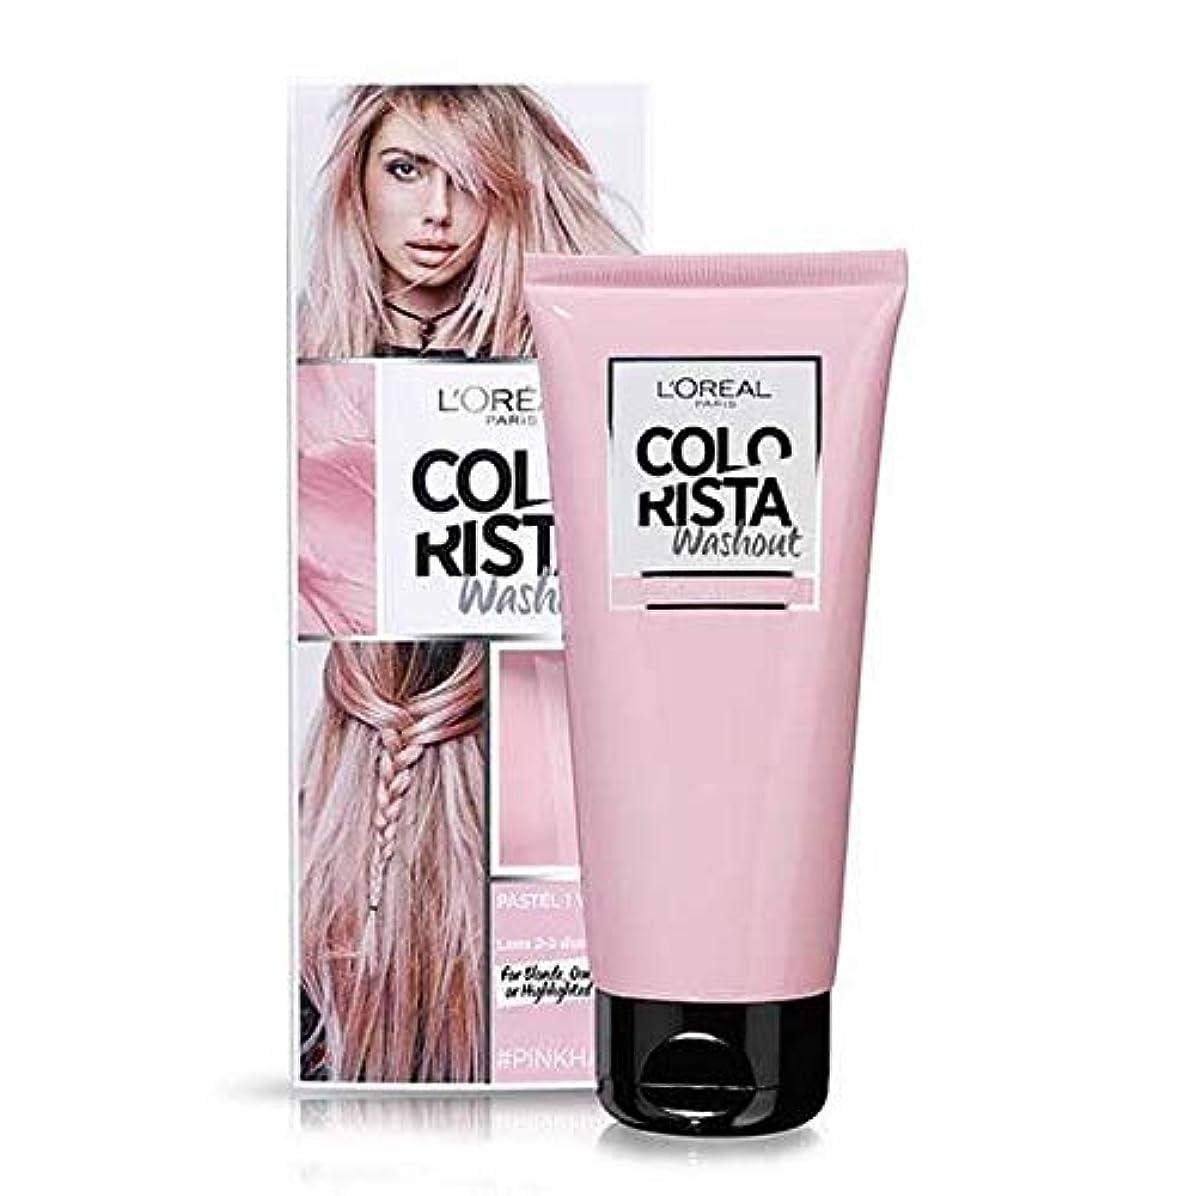 [Colorista] Colorista洗い出しピンク半永久染毛剤 - Colorista Washout Pink Semi-Permanent Hair Dye [並行輸入品]